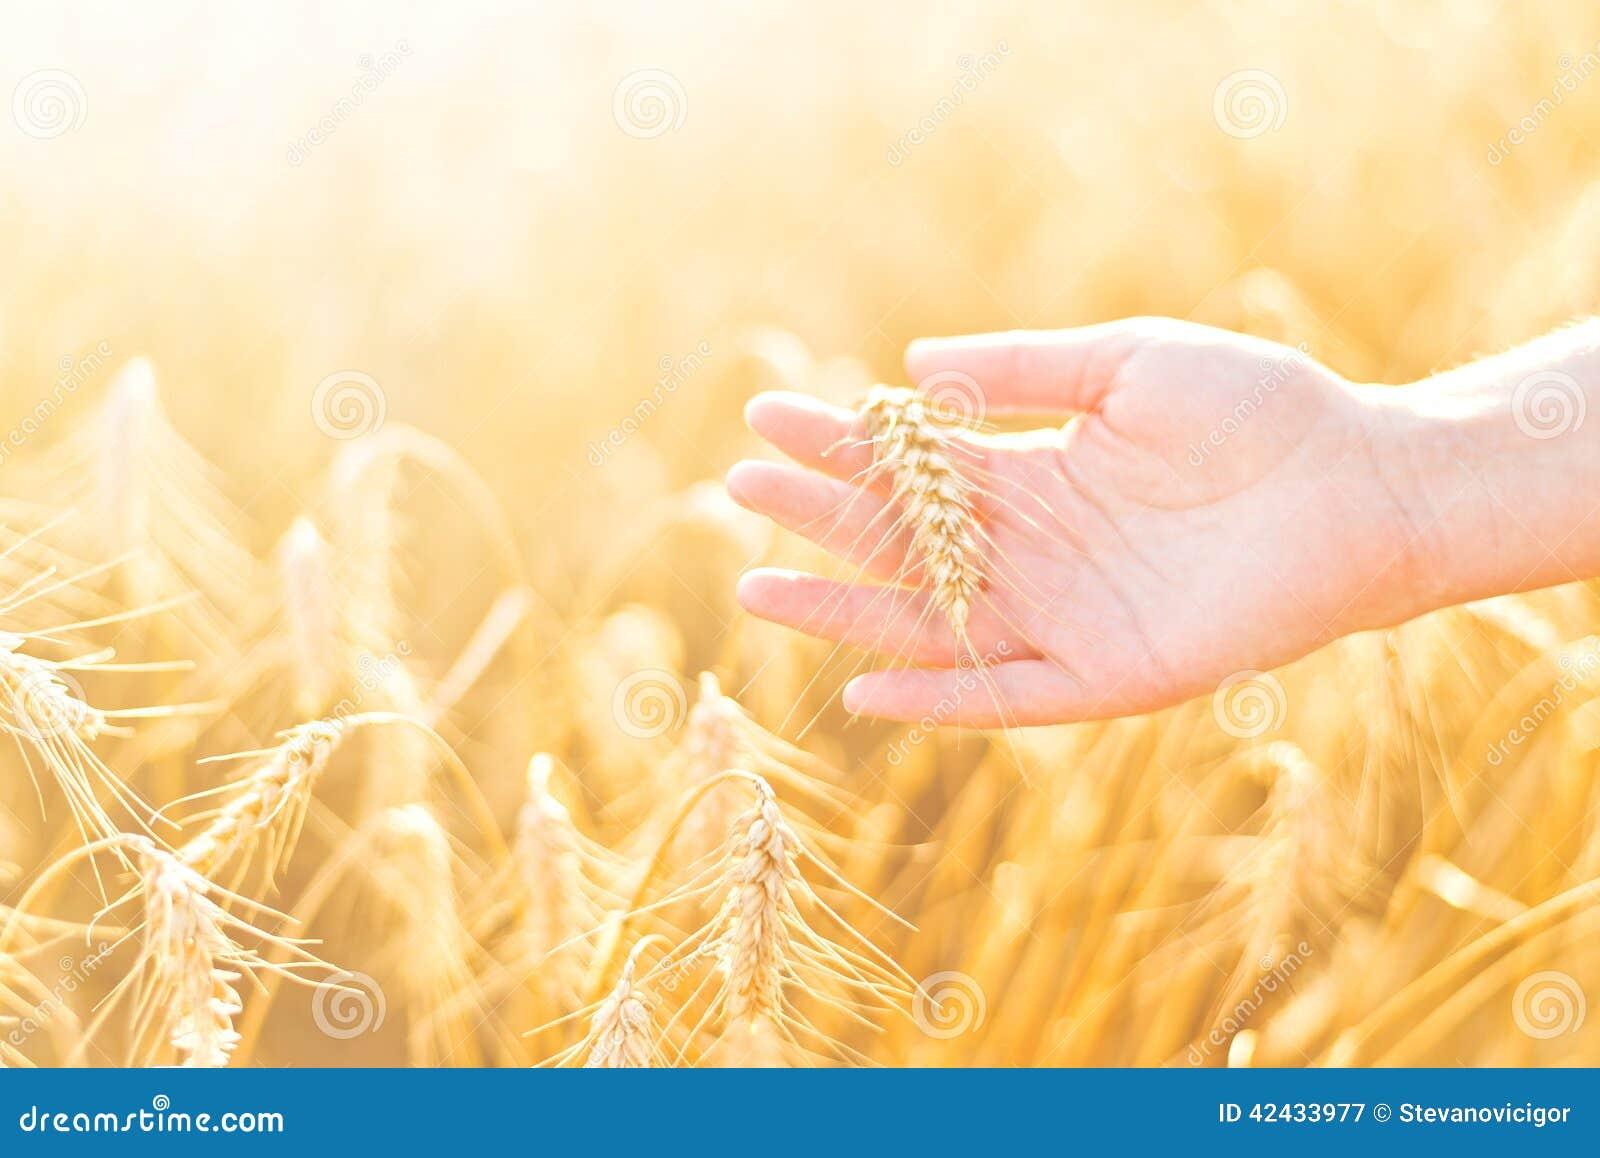 Mano femenina en campo de trigo agrícola cultivado